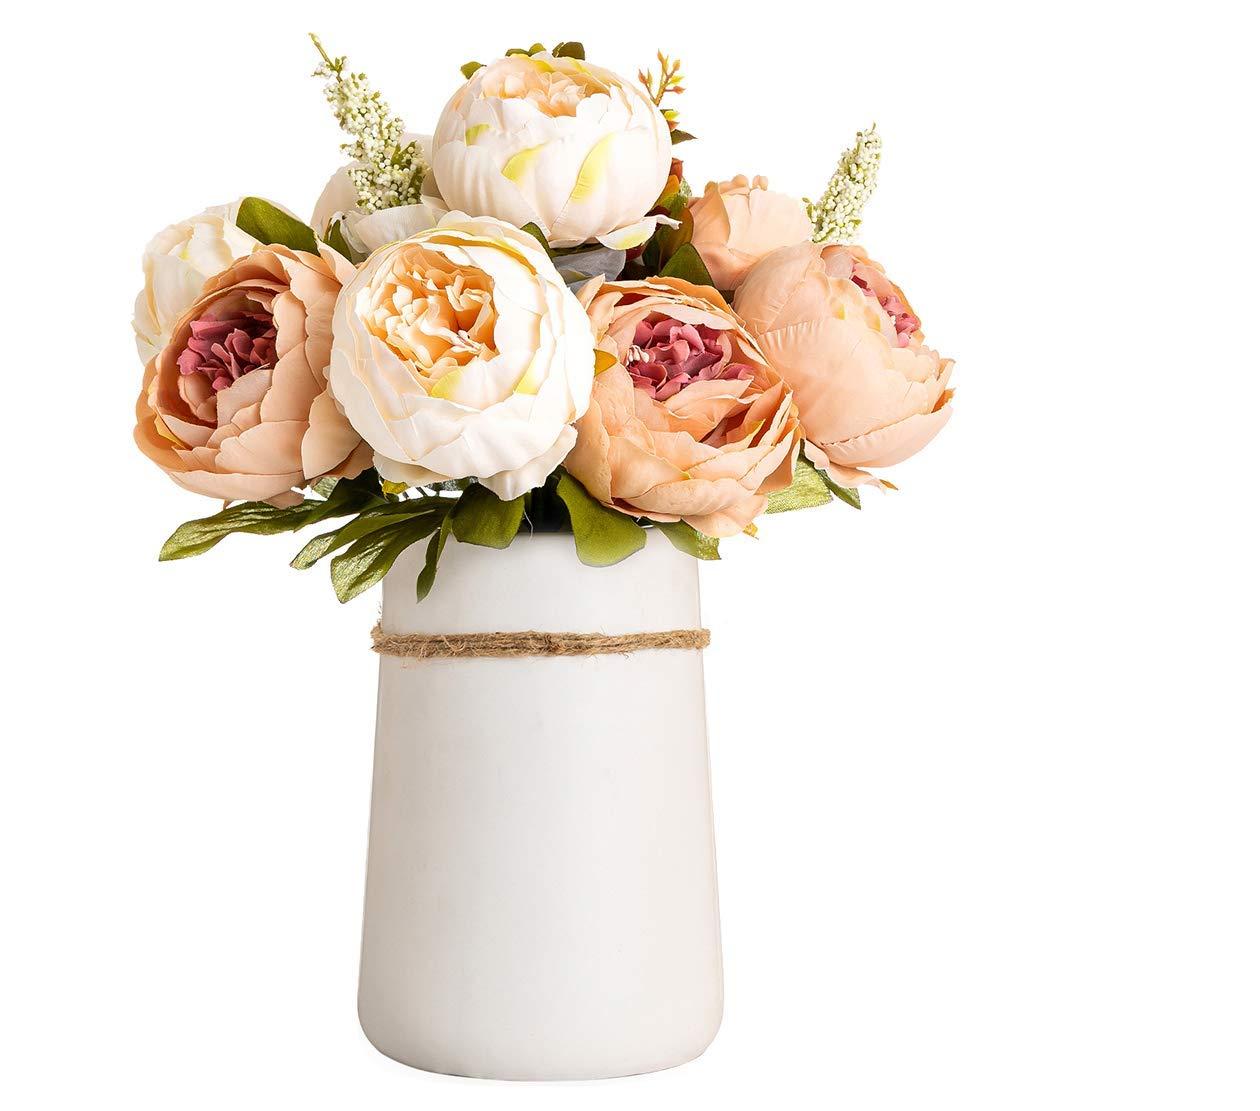 silk flower arrangements queen bee decor artificial silk peony flower bouquet with ceramic vase indoor/outdoor centerpiece events weddings birthday gift bridal floral flower arrangement (champagne)